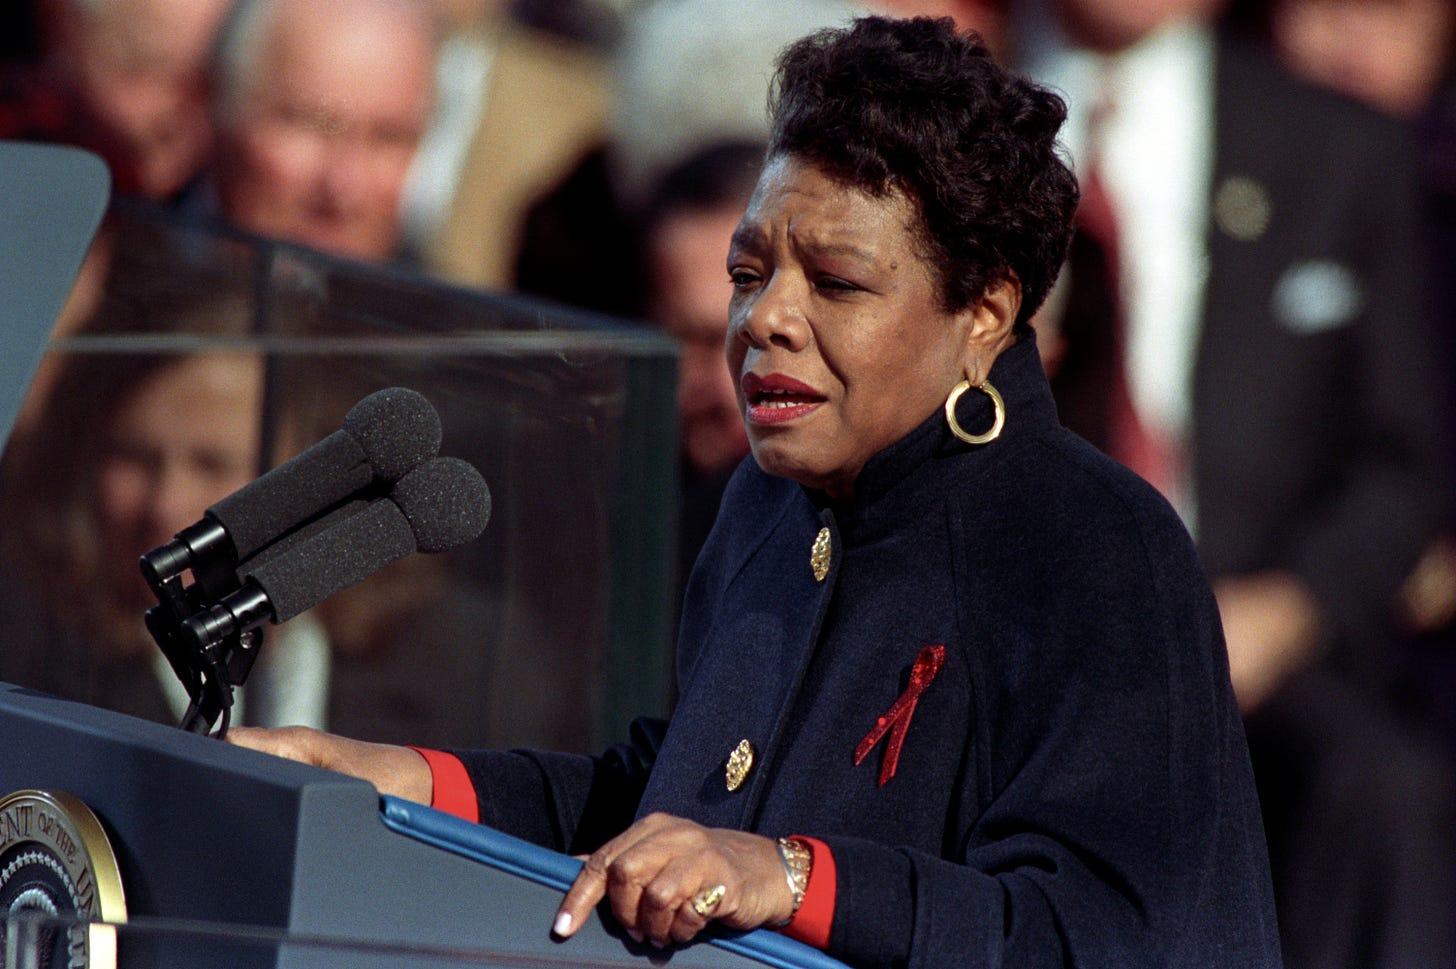 https://upload.wikimedia.org/wikipedia/commons/b/b4/Angelou_at_Clinton_inauguration.jpg